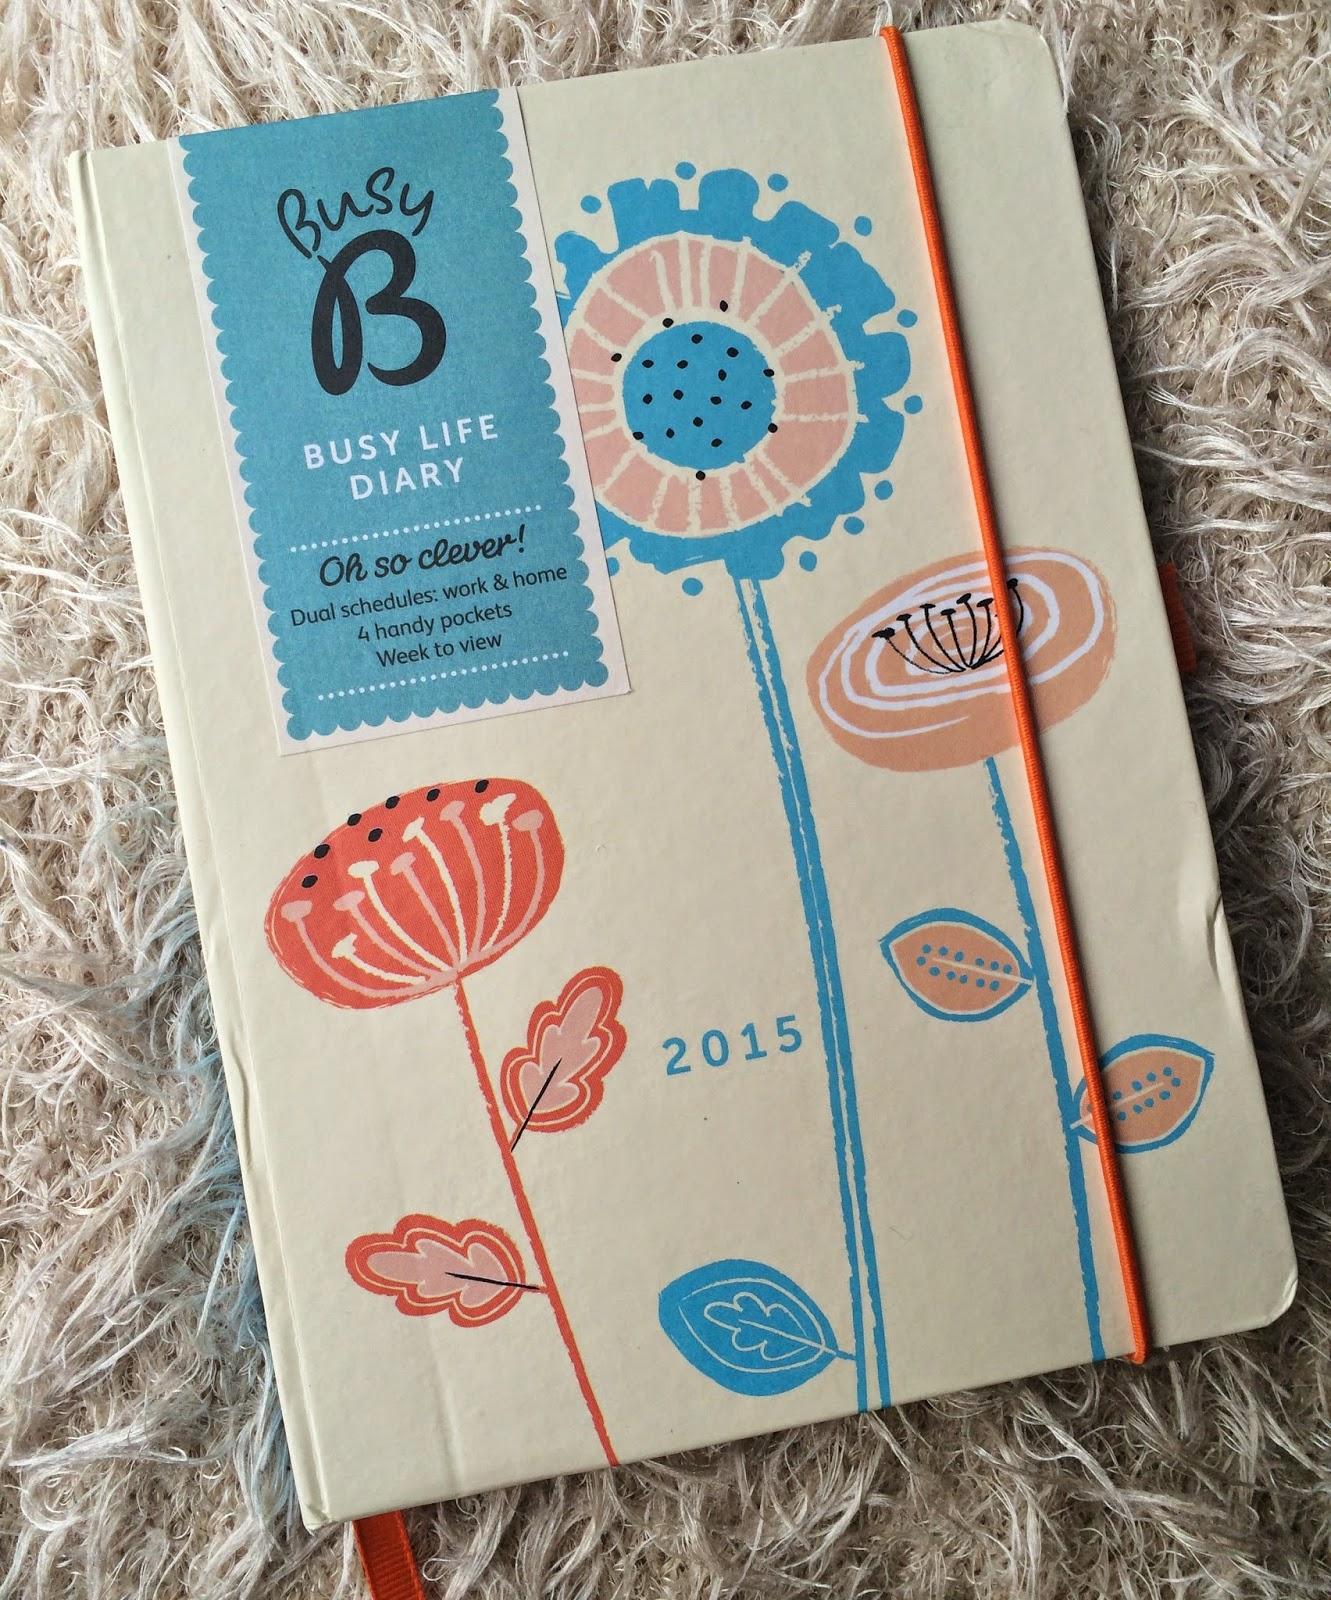 Busy-B-busy-life-diary